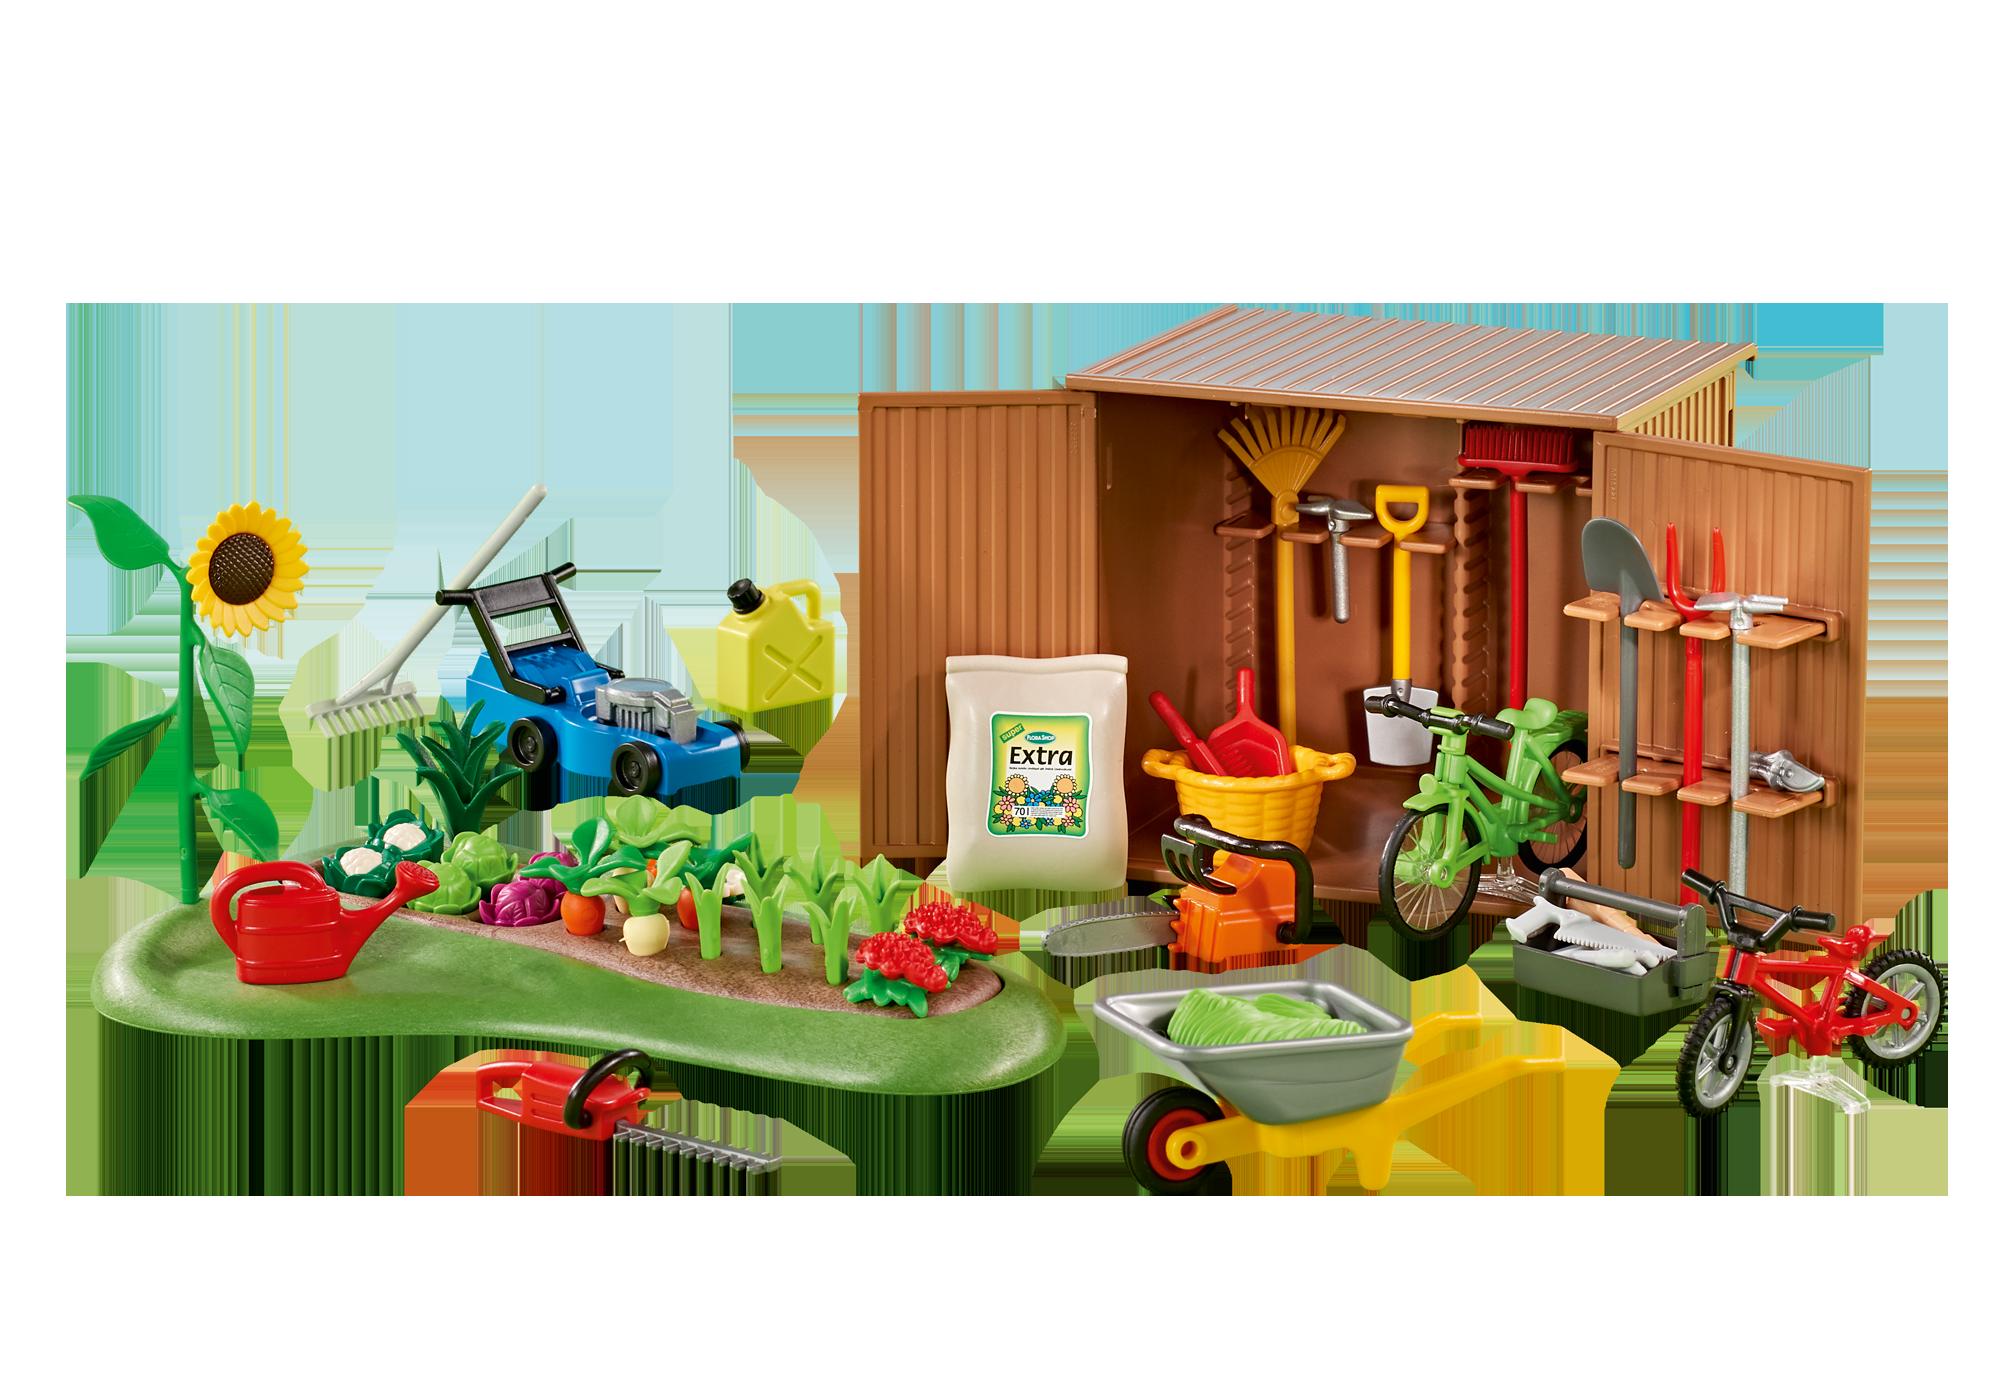 http://media.playmobil.com/i/playmobil/6558_product_detail/Tuinhuis met groententuin